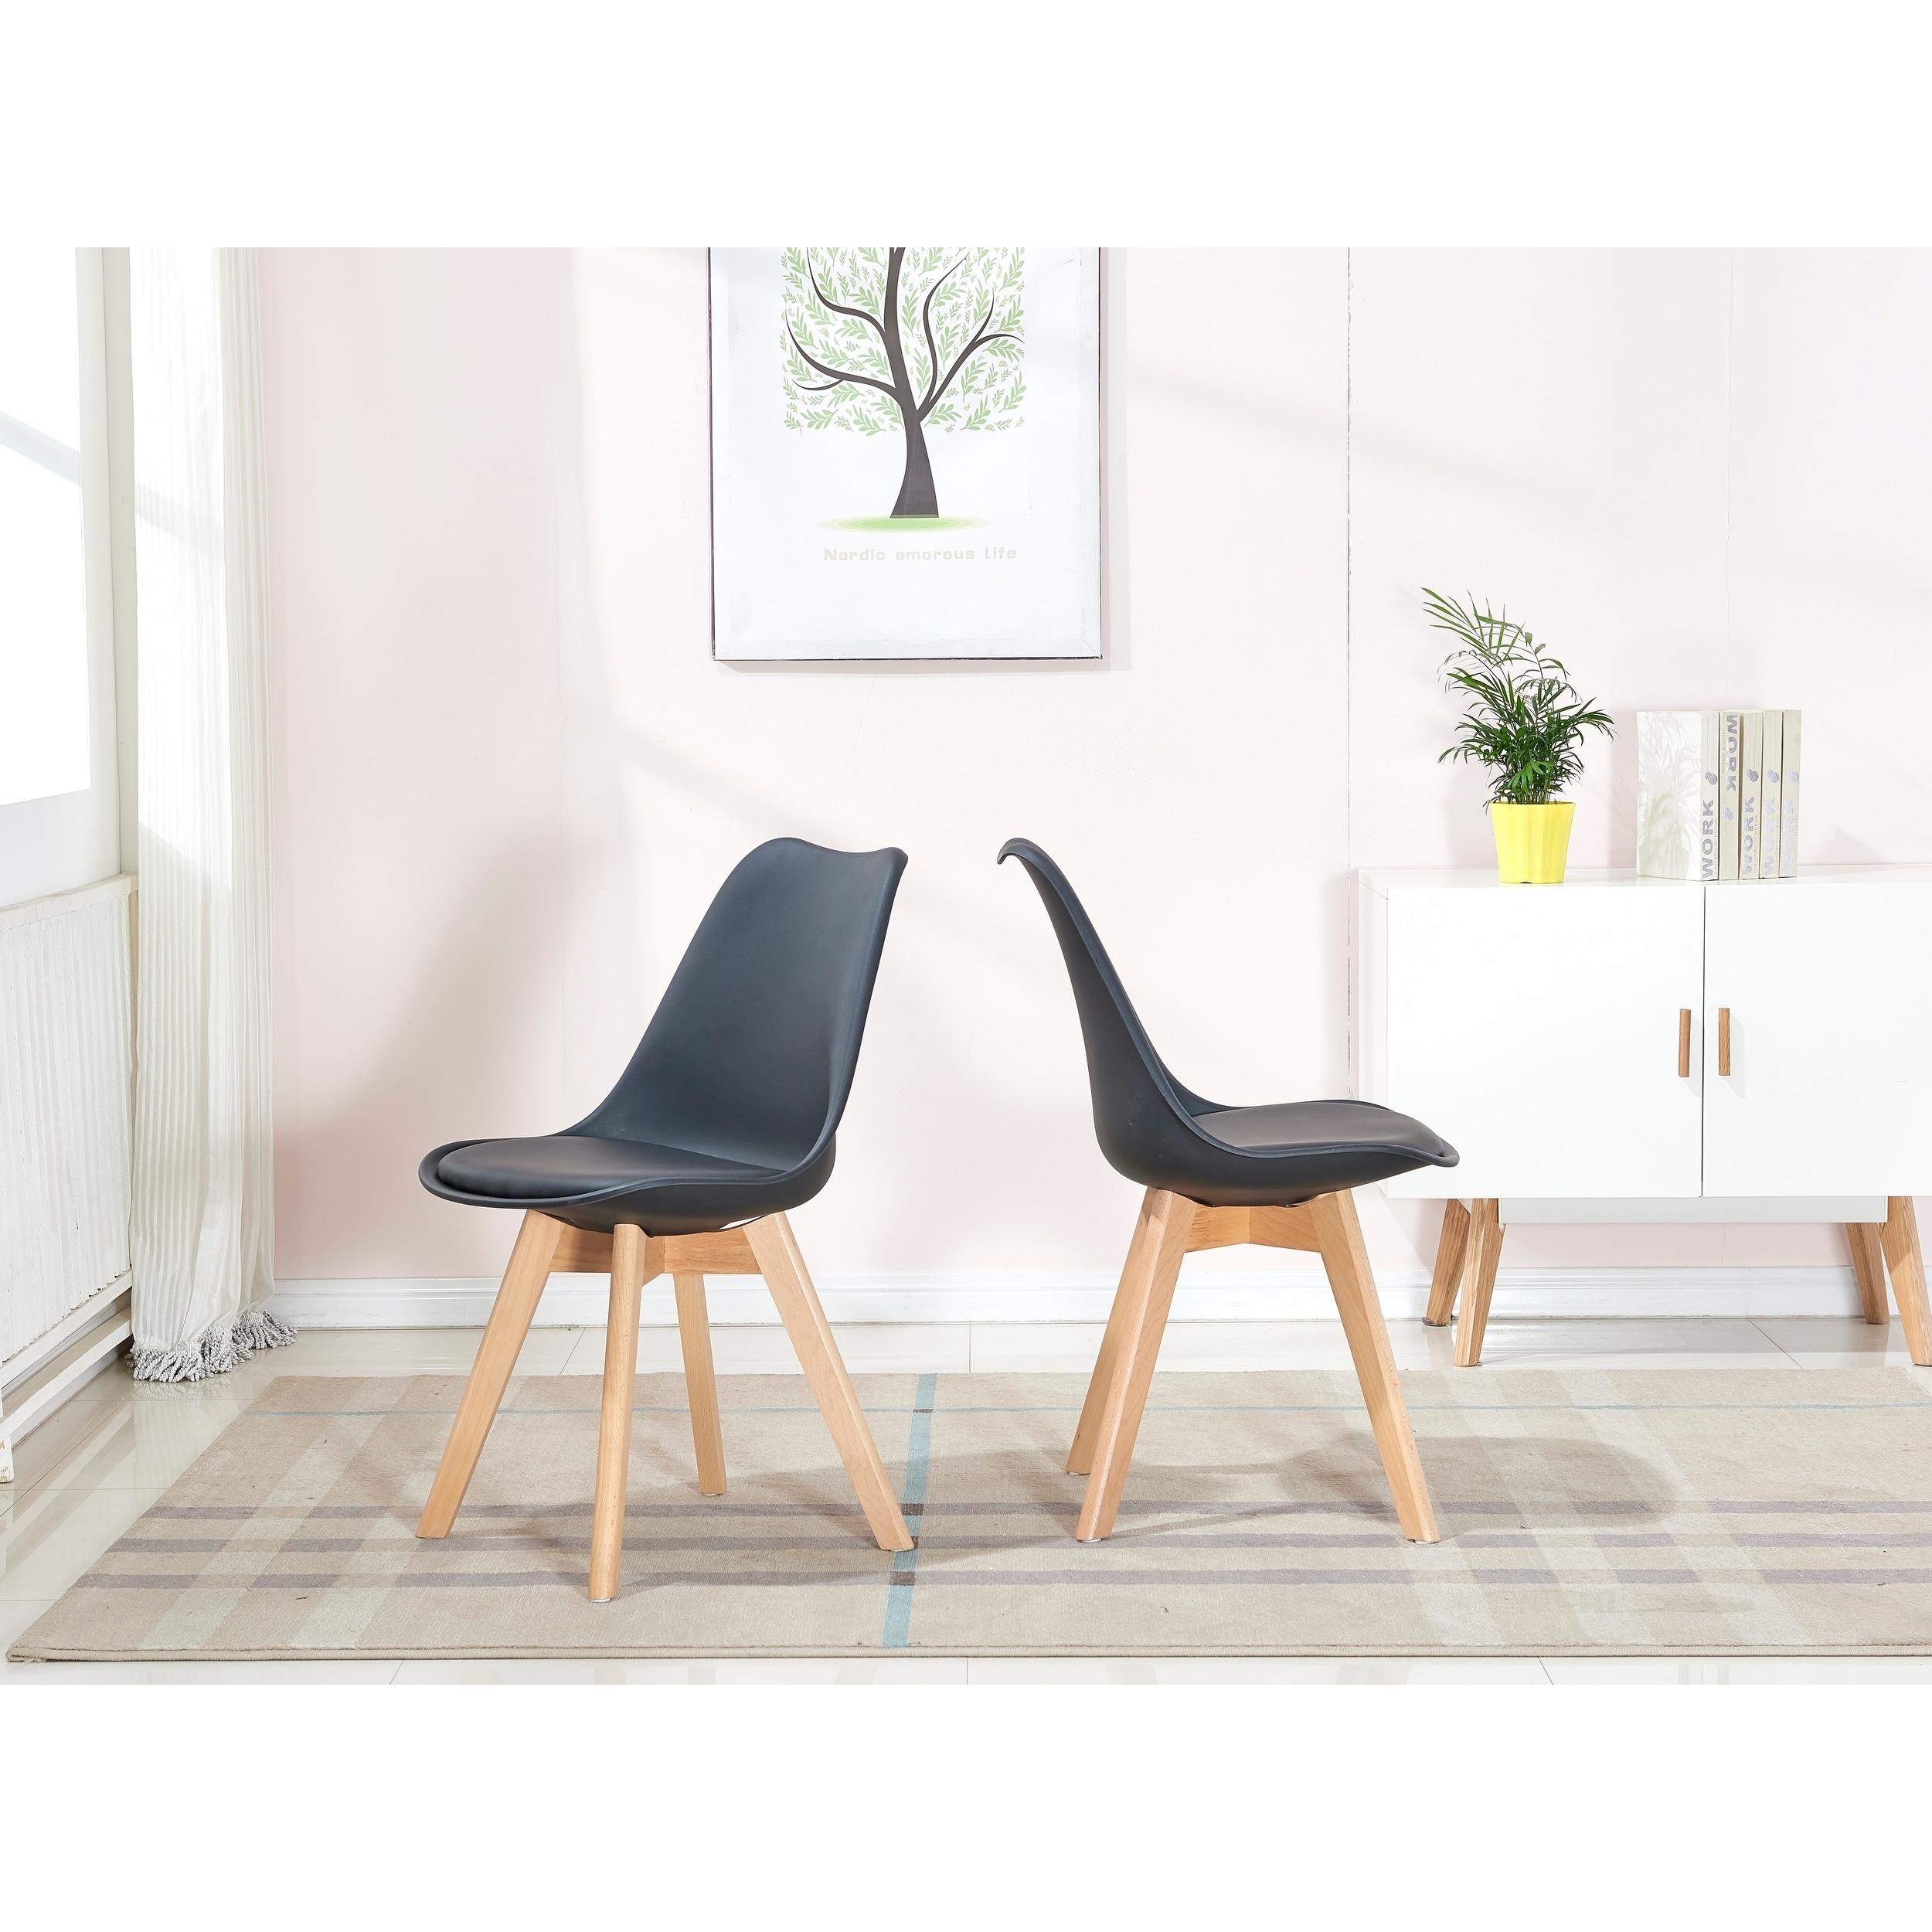 Best Master Furniture Mid Century Modern 5 Pieces Dining Set